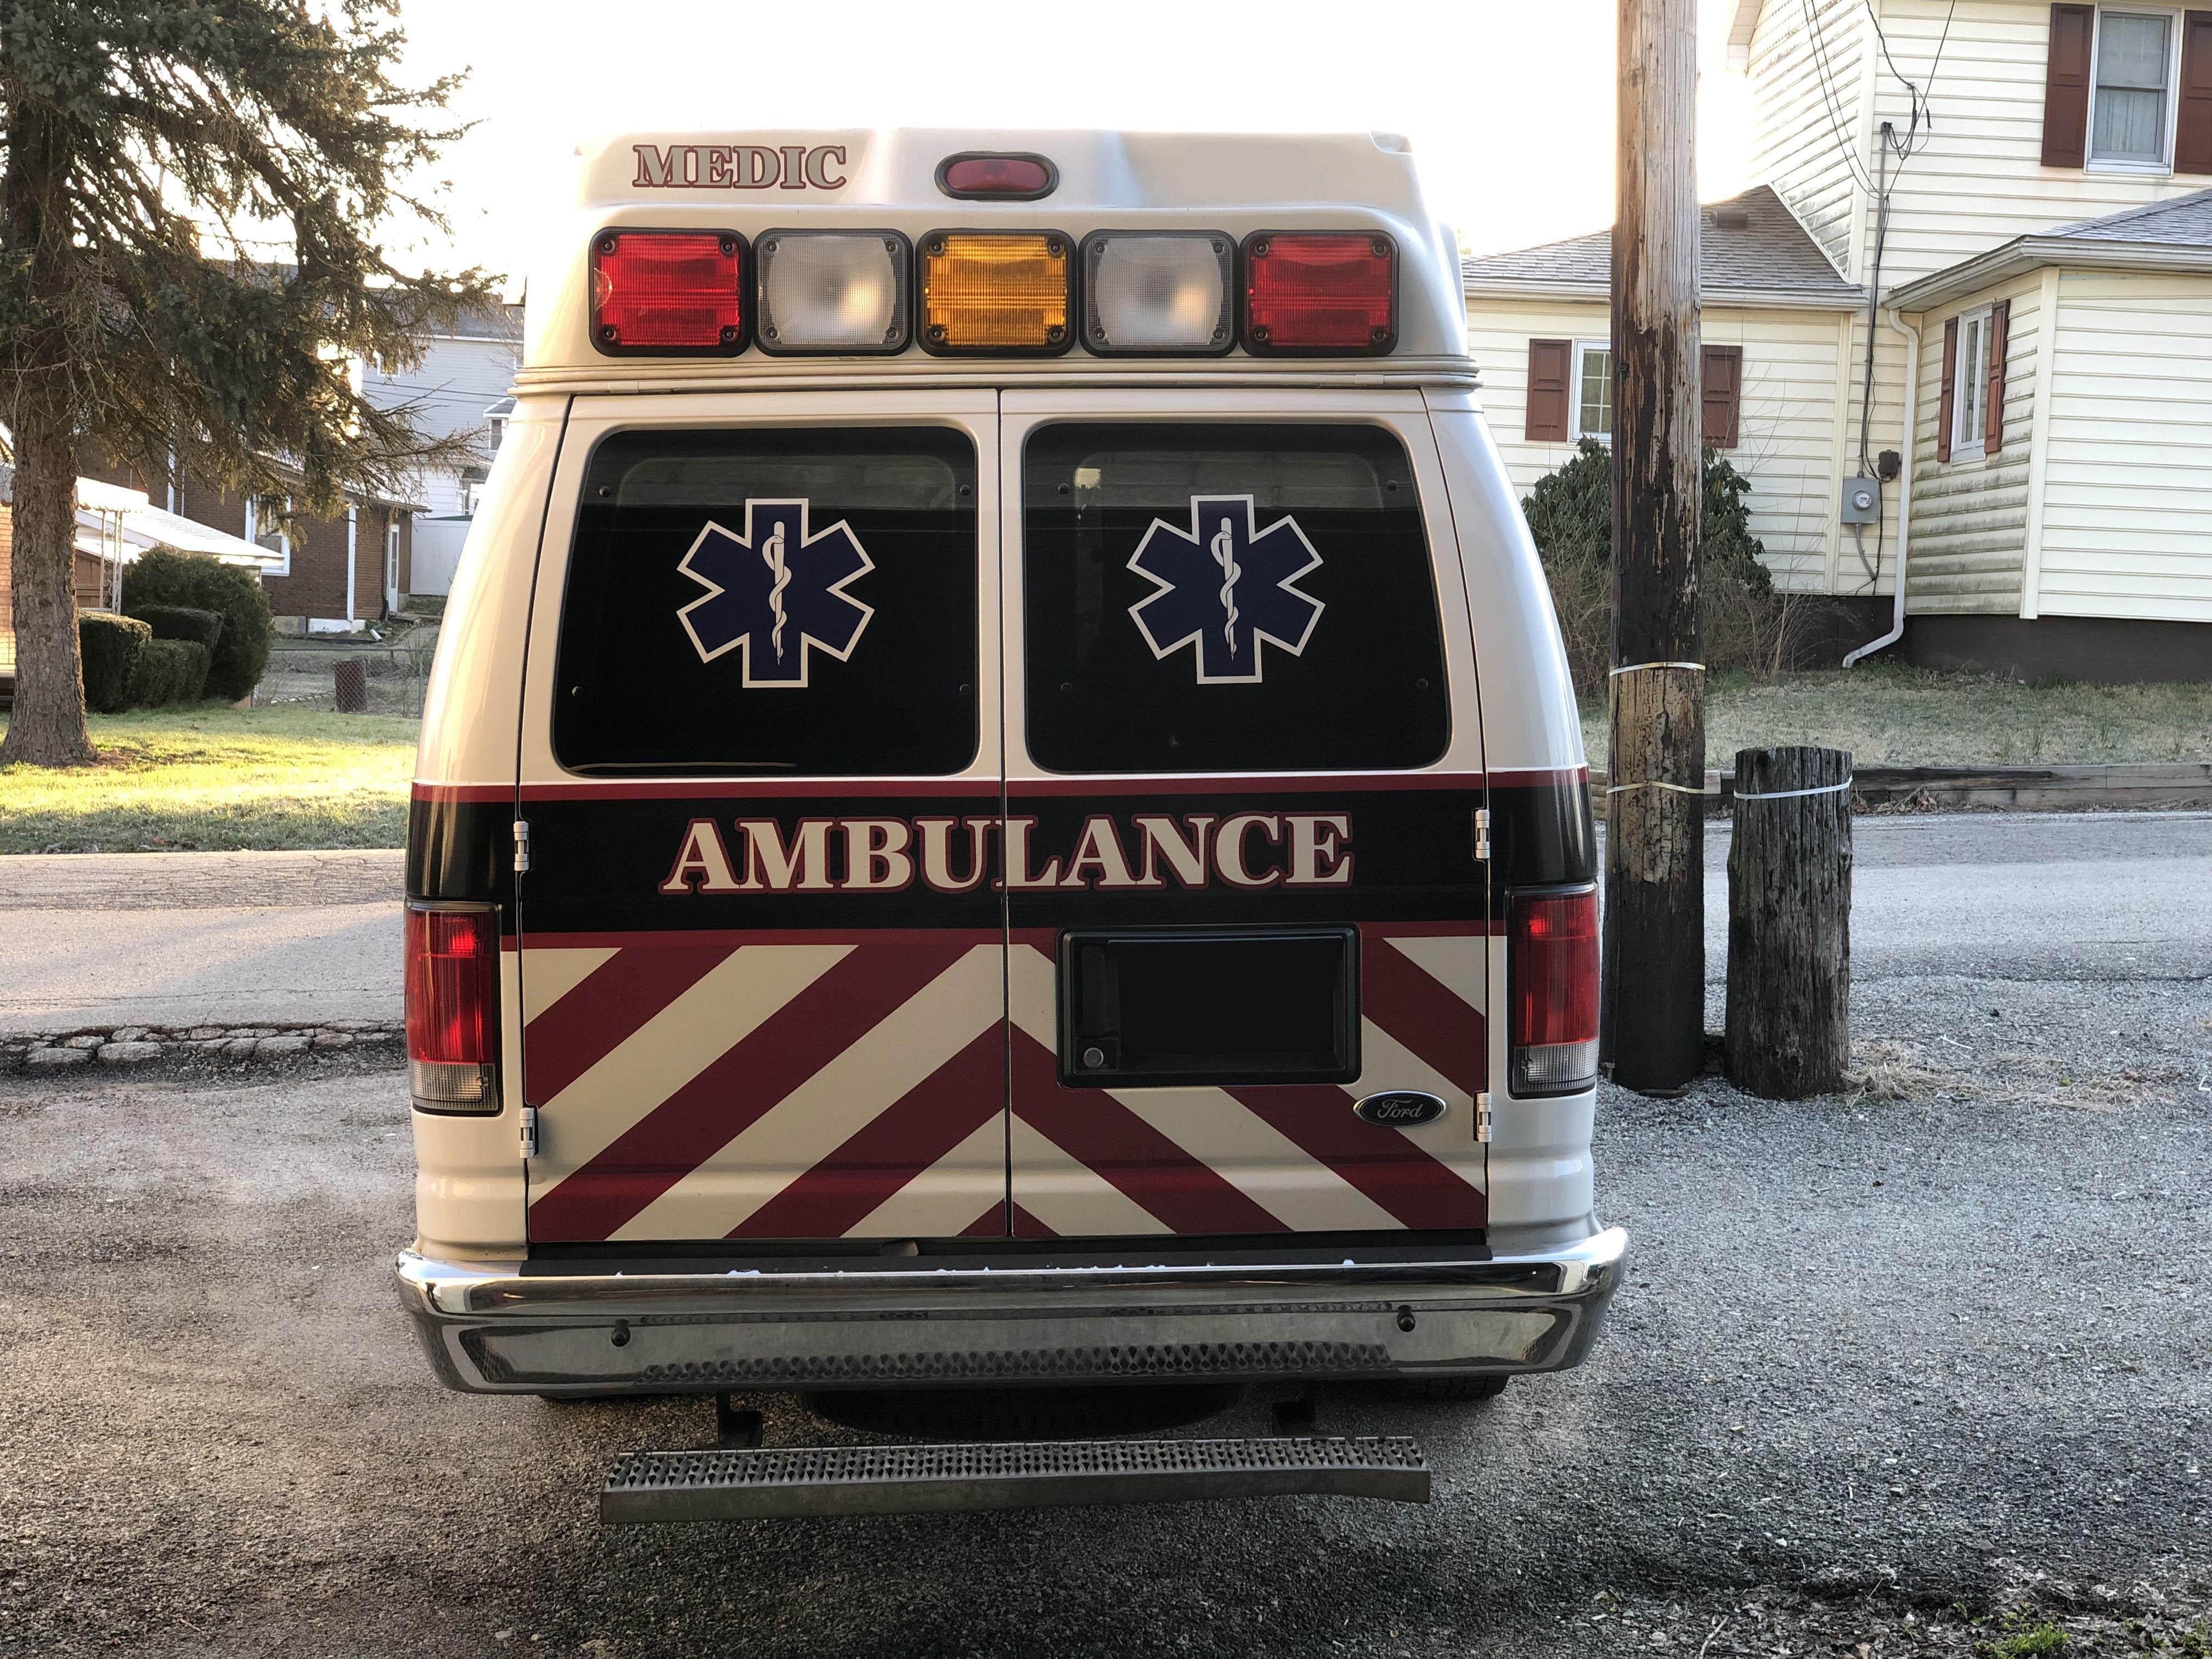 2014 AEV Ford Ambulance   Used Truck Details